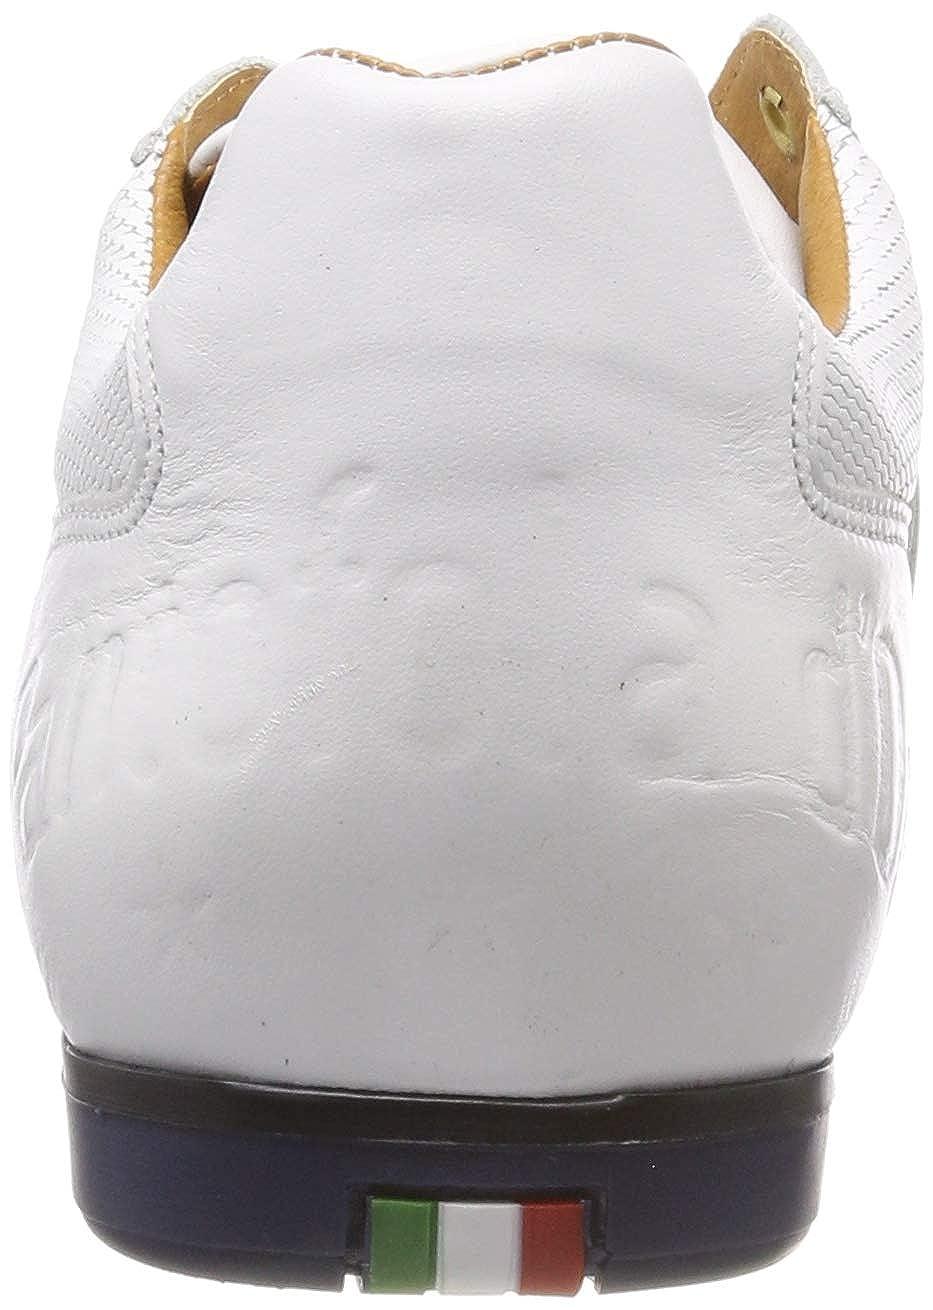 Pantofola d'Gold Herren Imola Cb herren Low Turnschuhe B07FTVVZMB B07FTVVZMB B07FTVVZMB 26258f